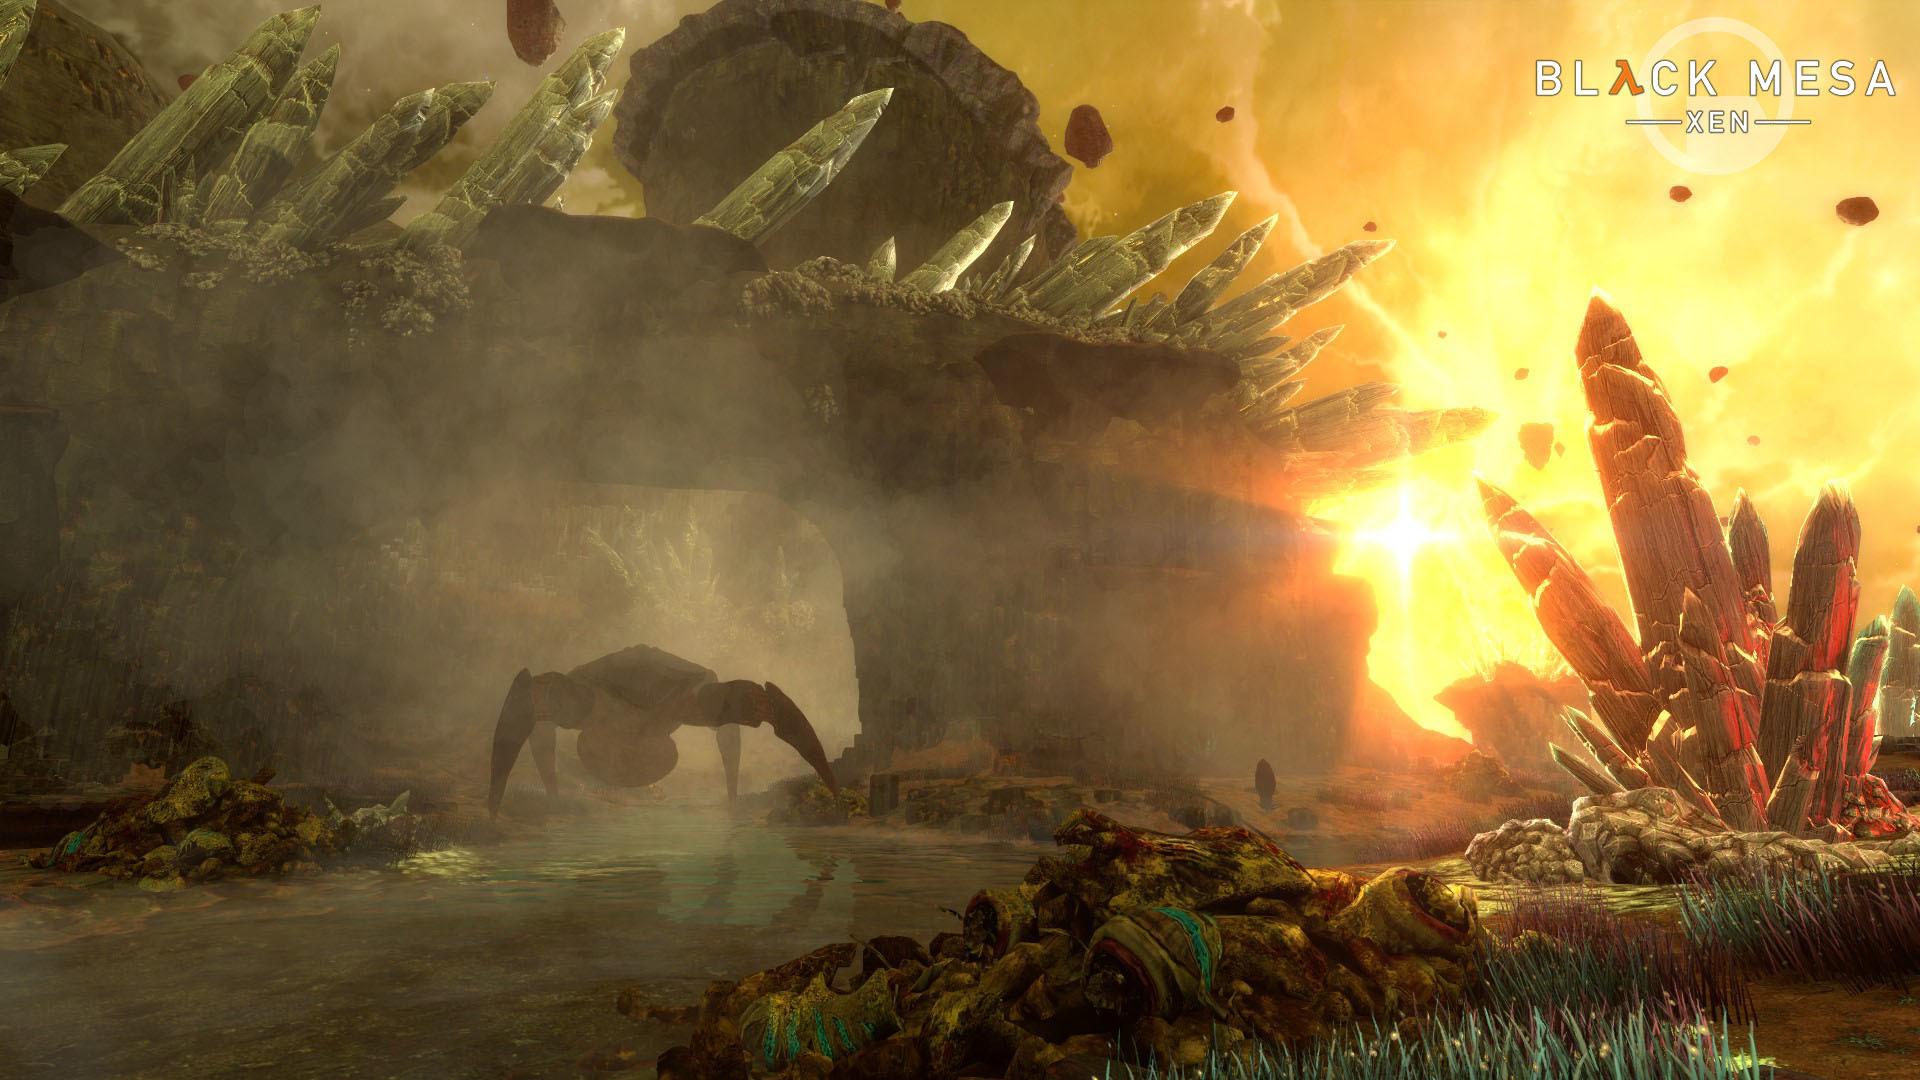 Xen pro Black Mesu se má čile k světu Black Mesa XEN